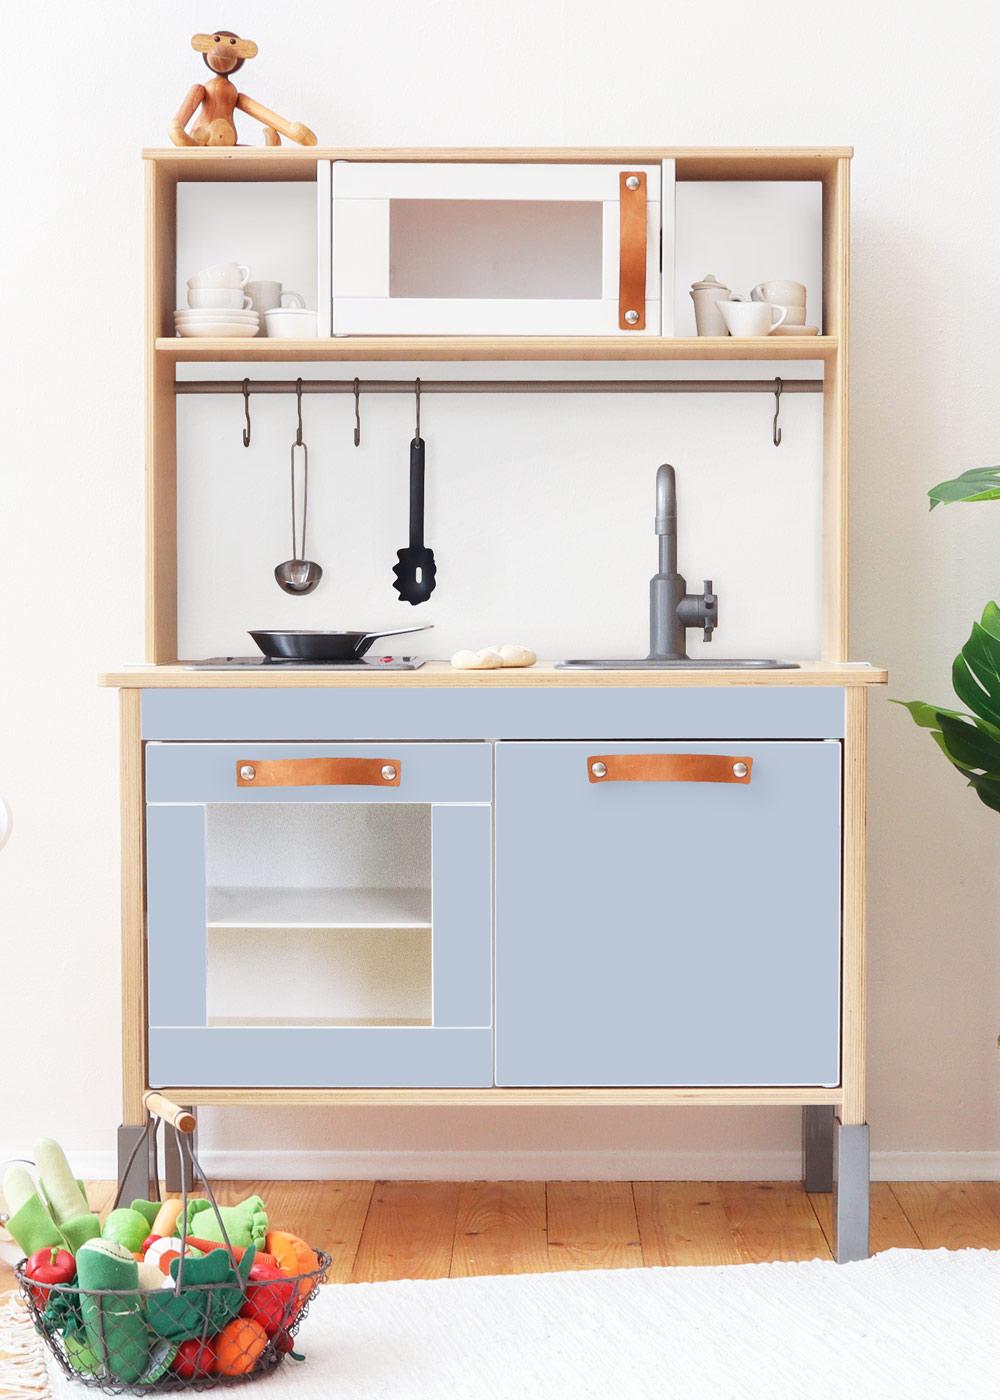 Ikea Duktig Kinderküche Frontli Nordisch blau Frontansicht